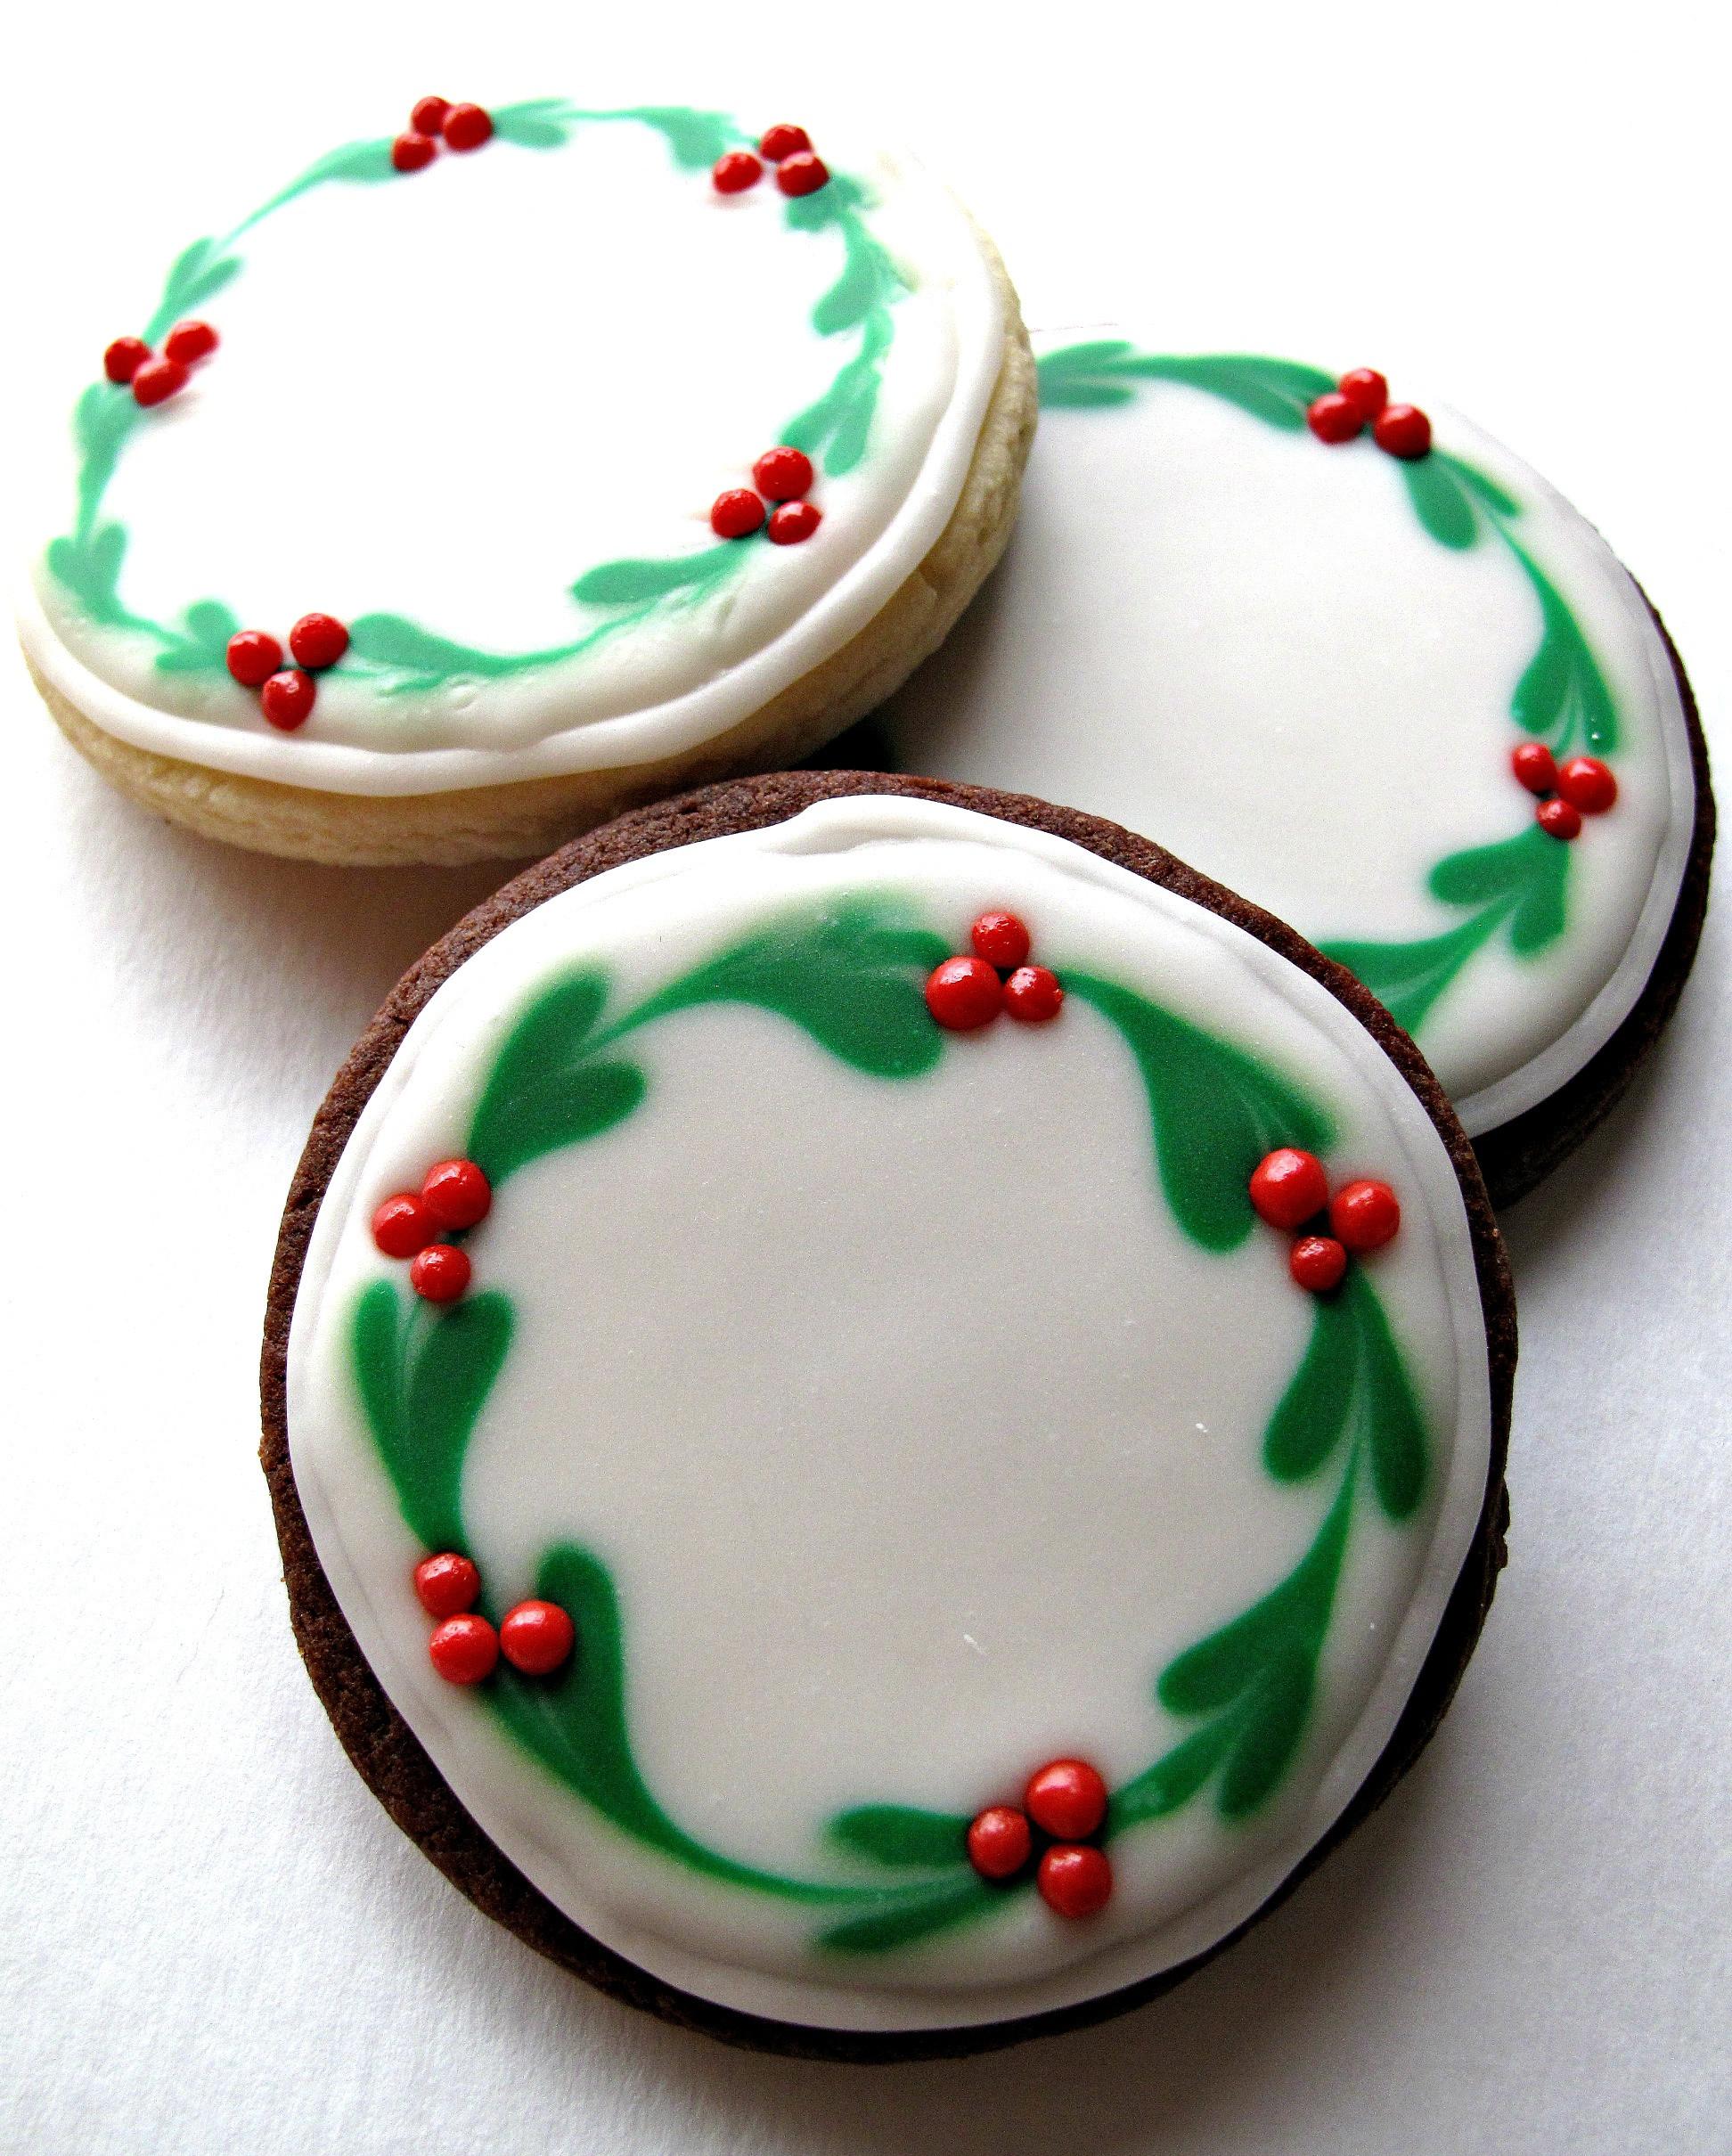 Easy Christmas Sugar Cookies  Chocolate Covered Oreos and Iced Christmas Sugar Cookies